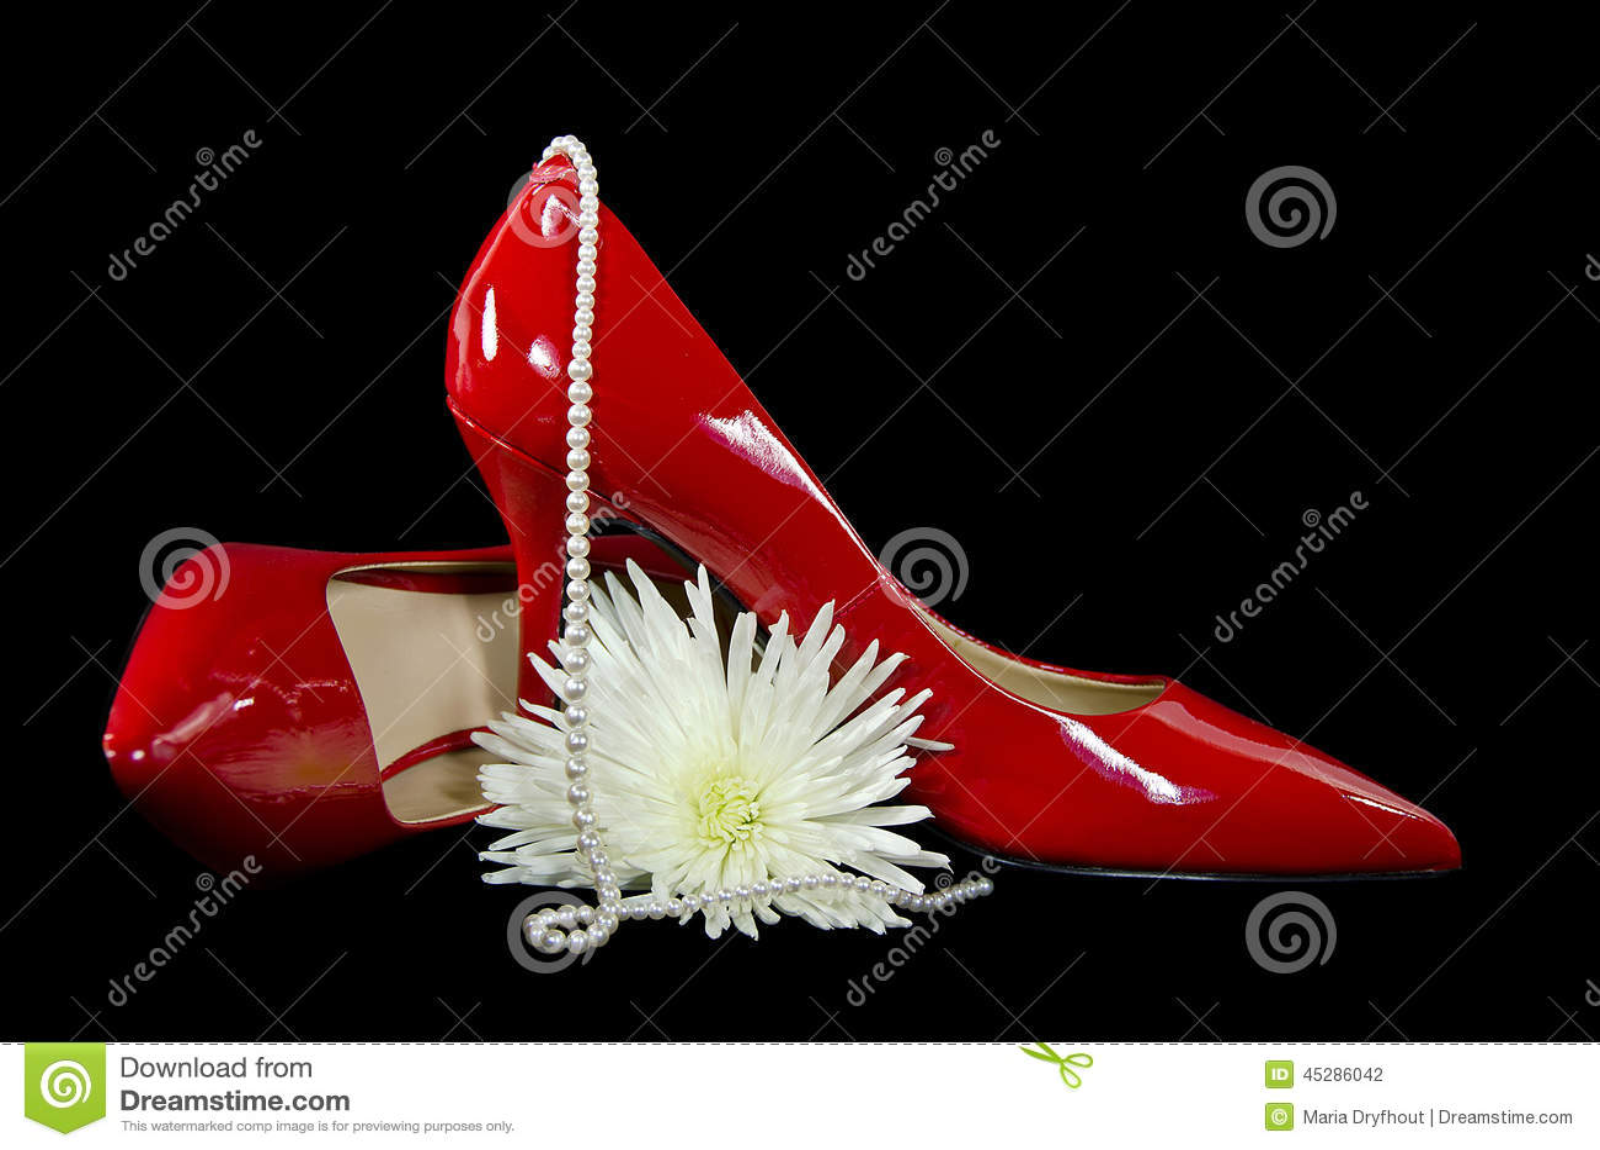 Red Shiny Heels